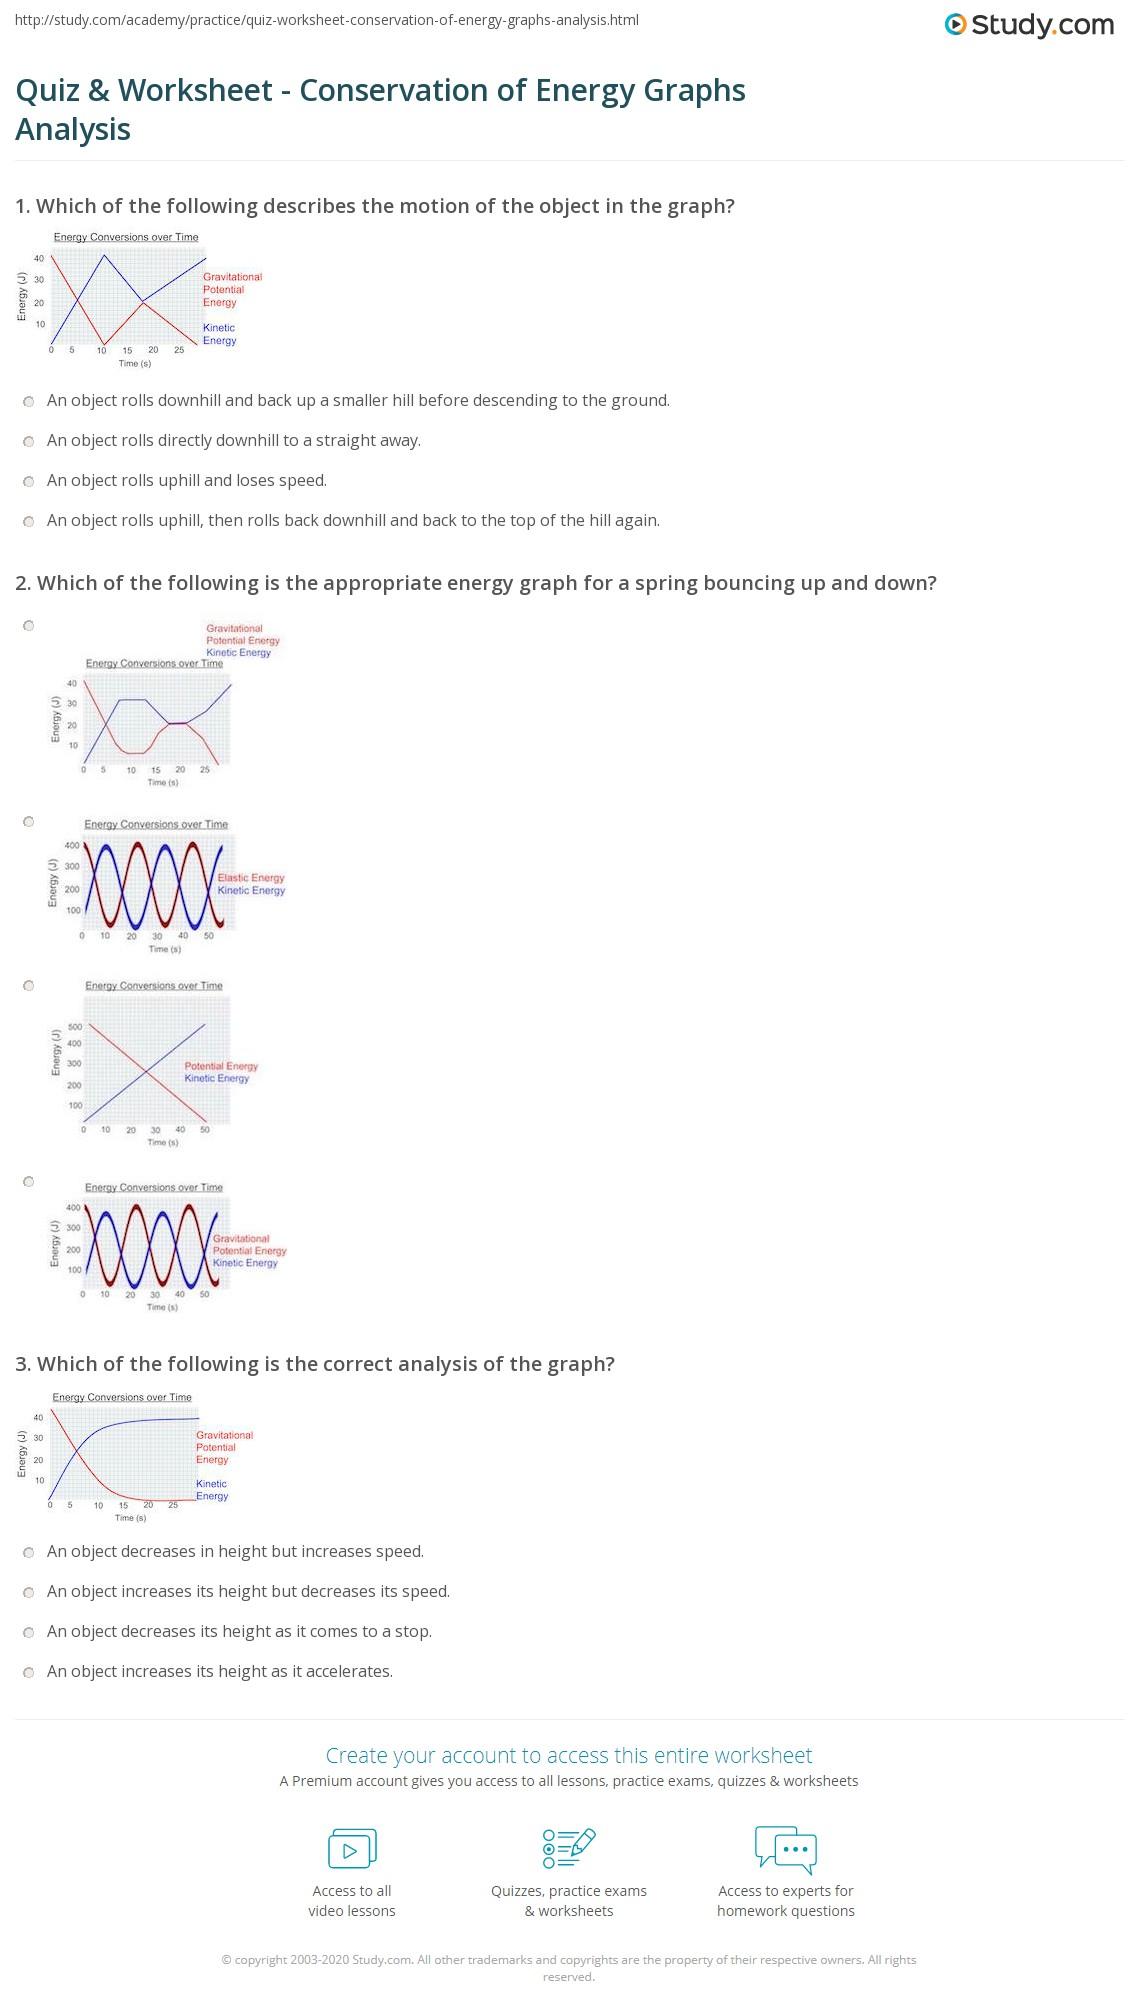 Quiz & Worksheet - Conservation of Energy Graphs Analysis | Study.com